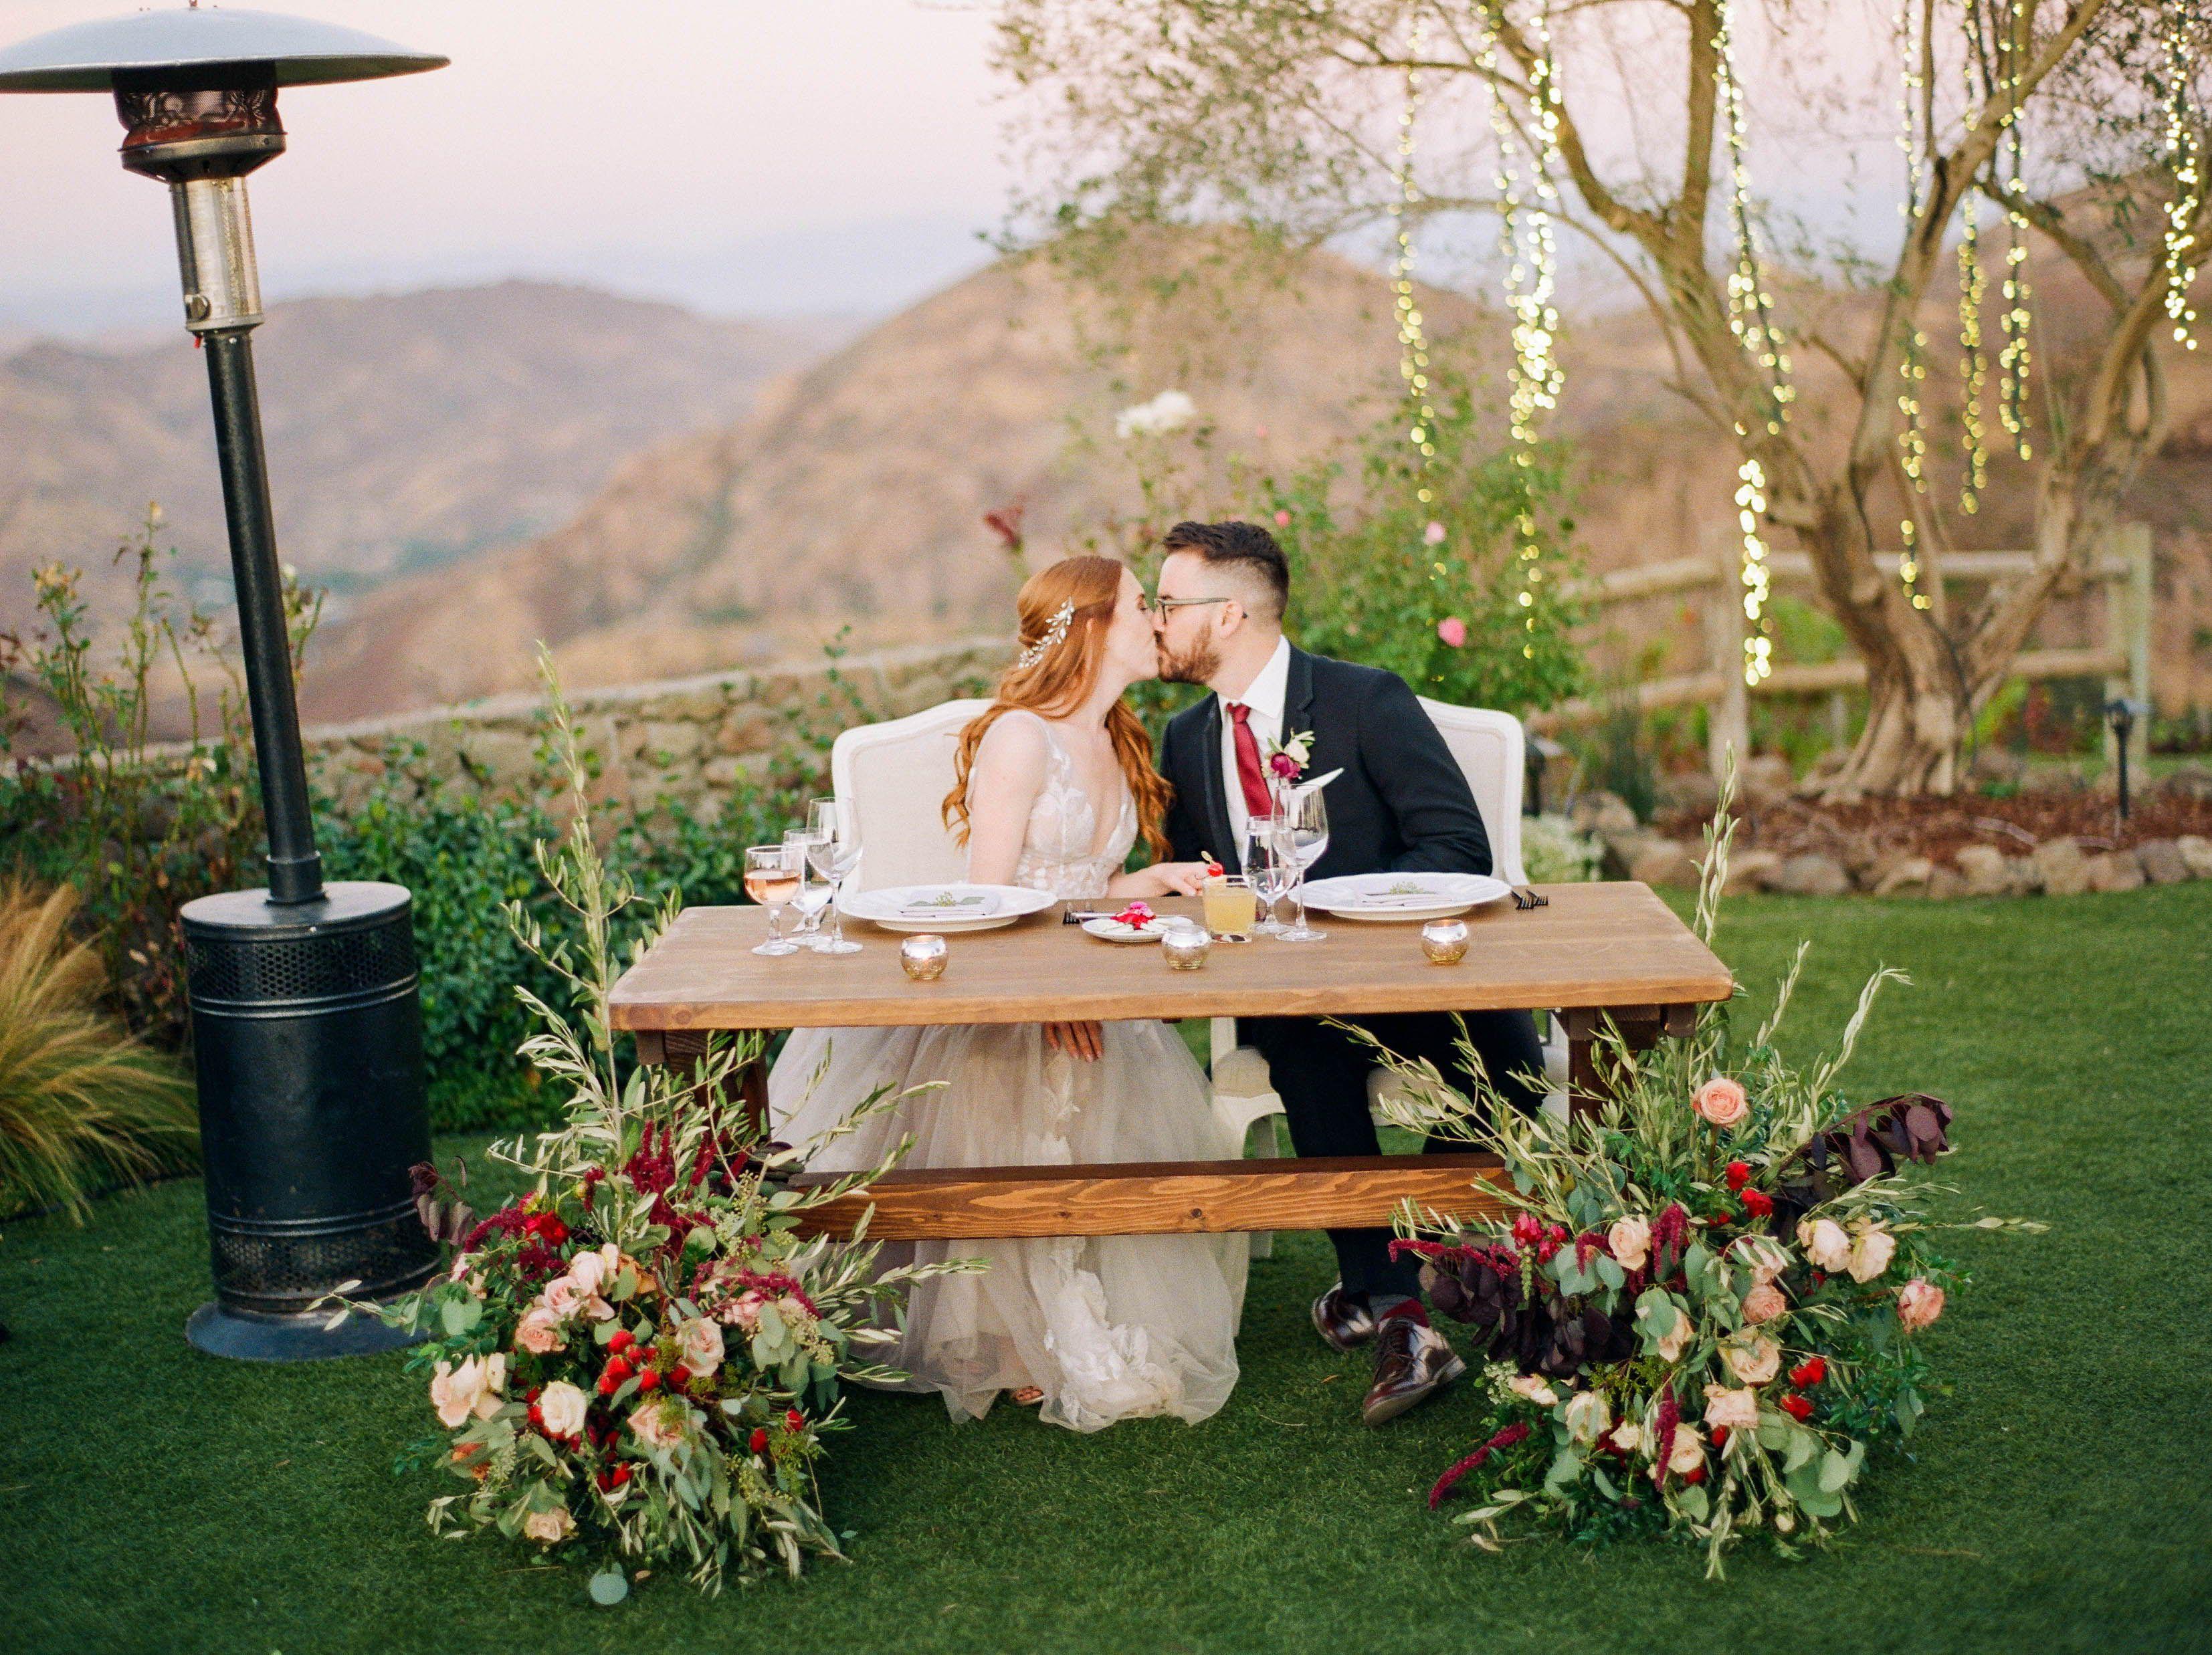 Michigan Destination Wedding Photographer Destination Wedding Photographer House Photography Destination Wedding